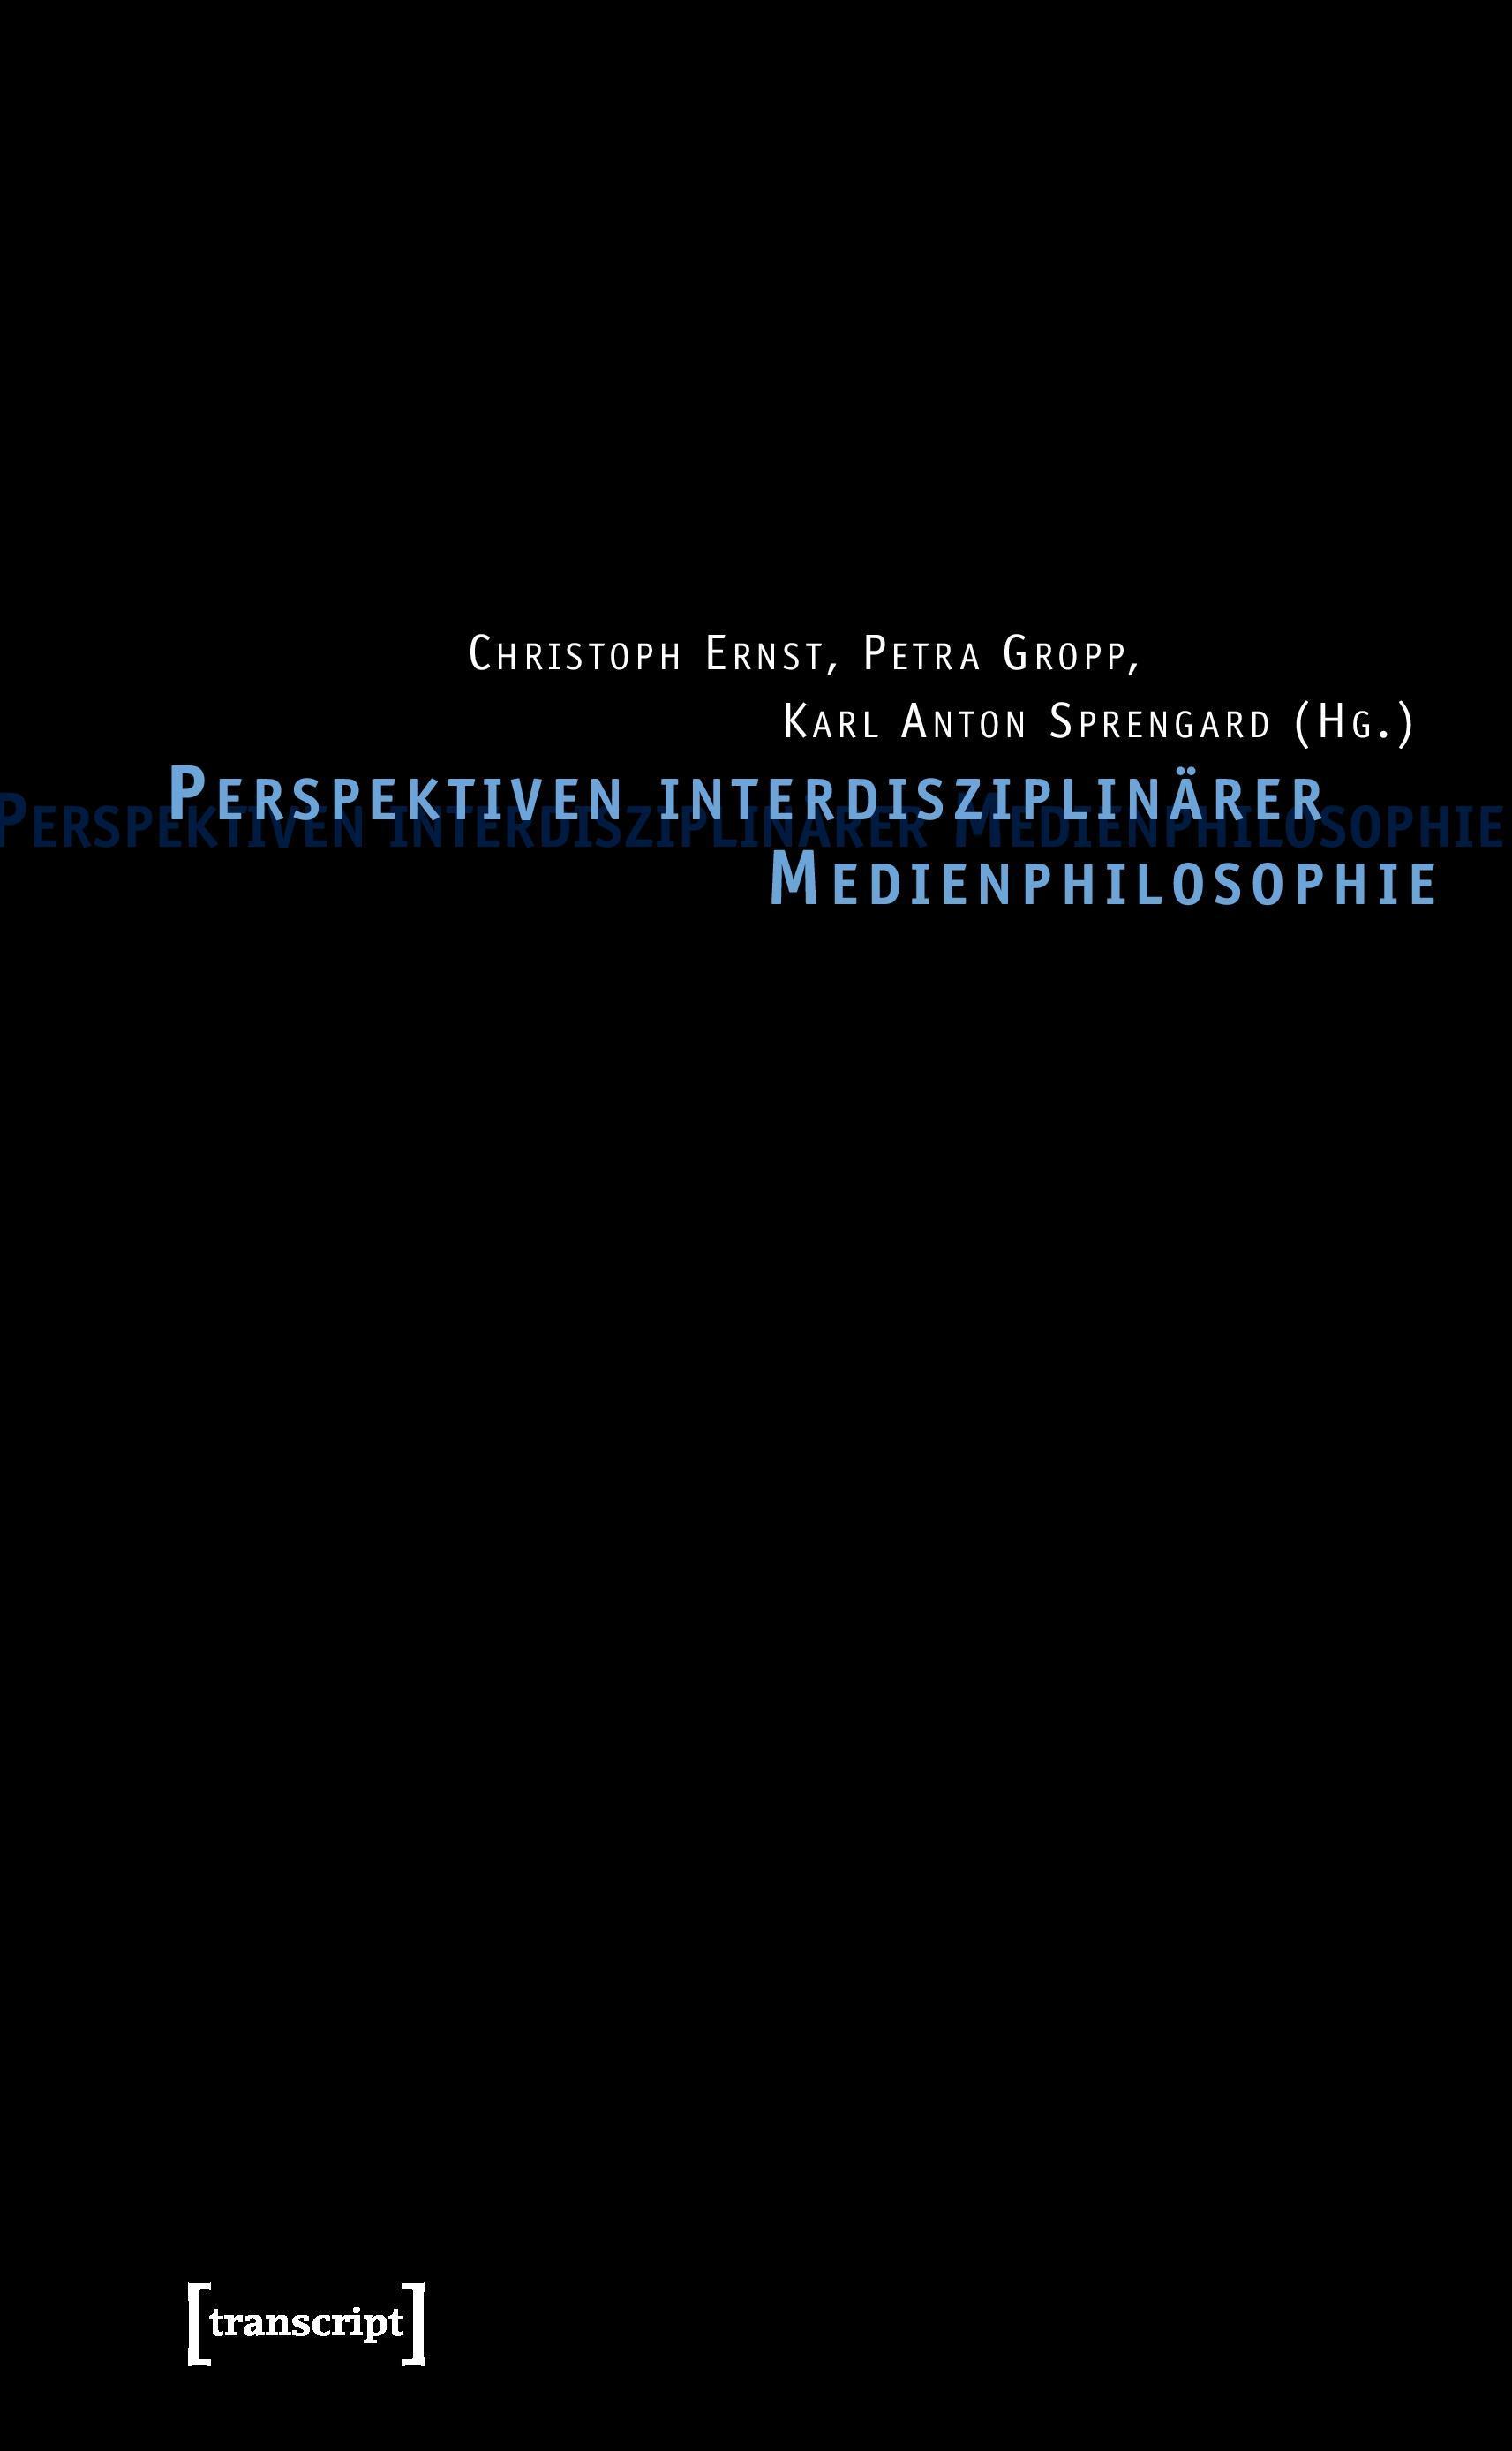 Perspektiven interdisziplinärer Medien Philosophie Christoph Ernst